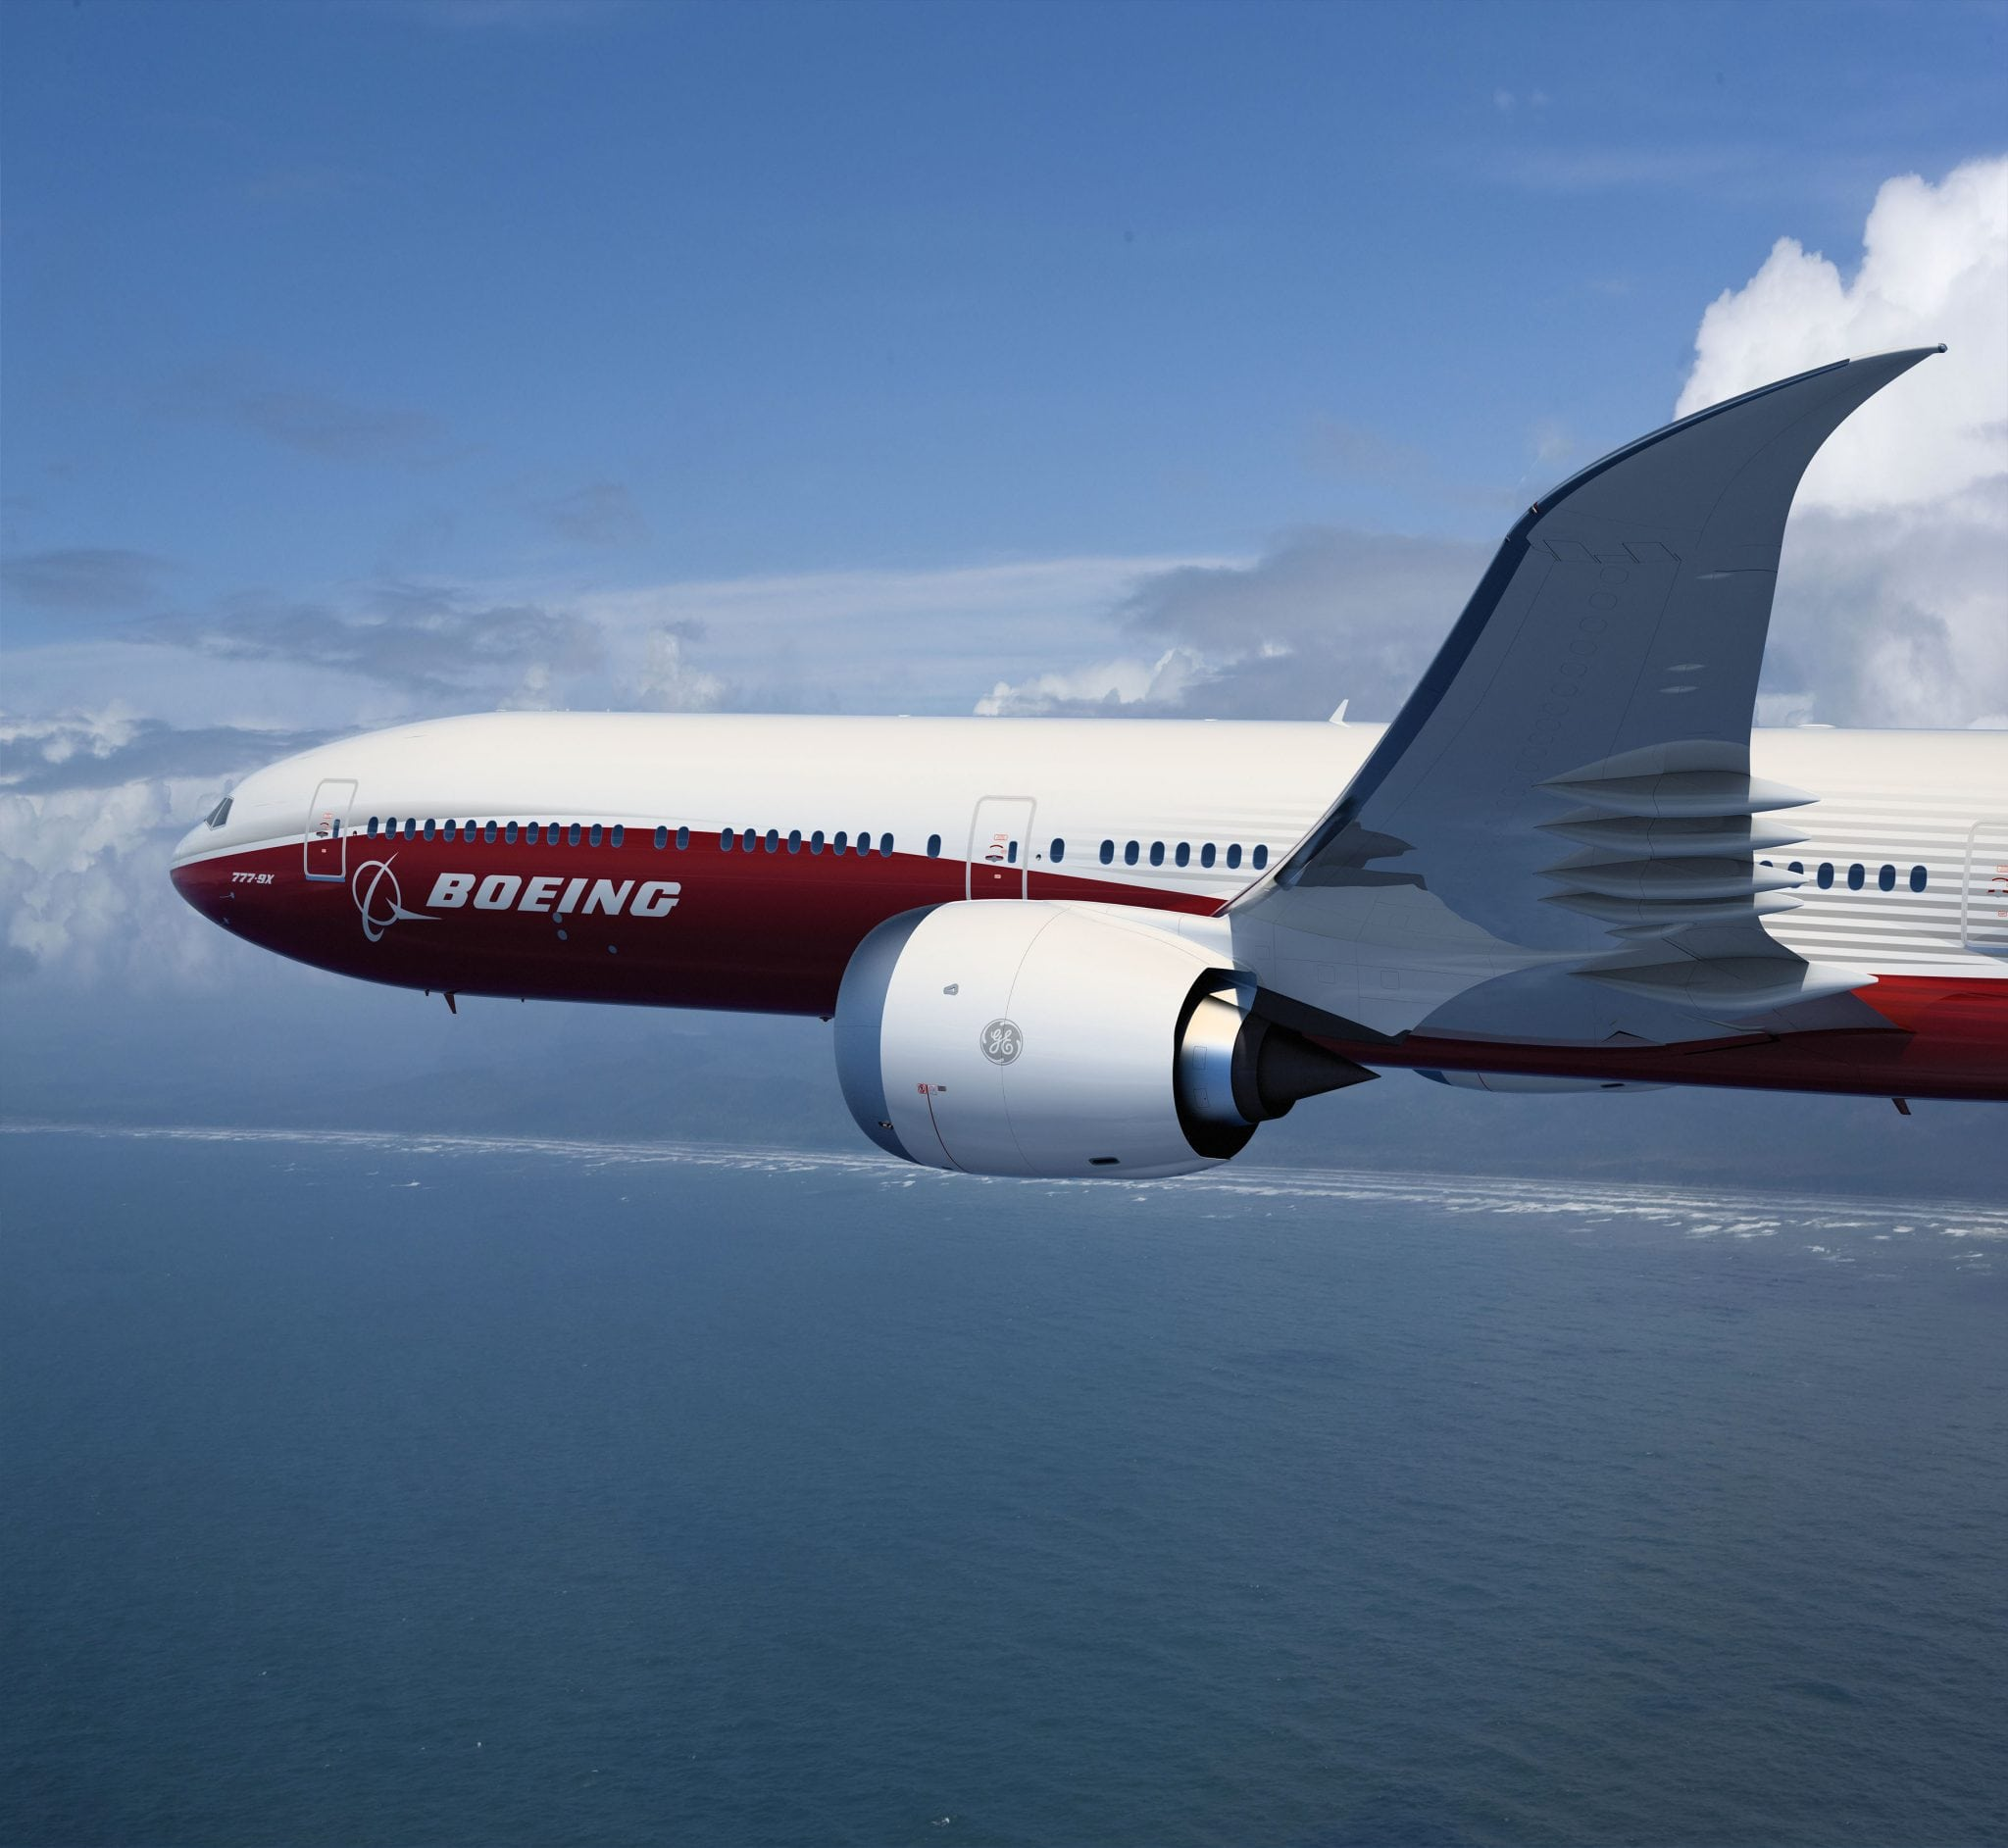 Boeing 777X aircraft in flight